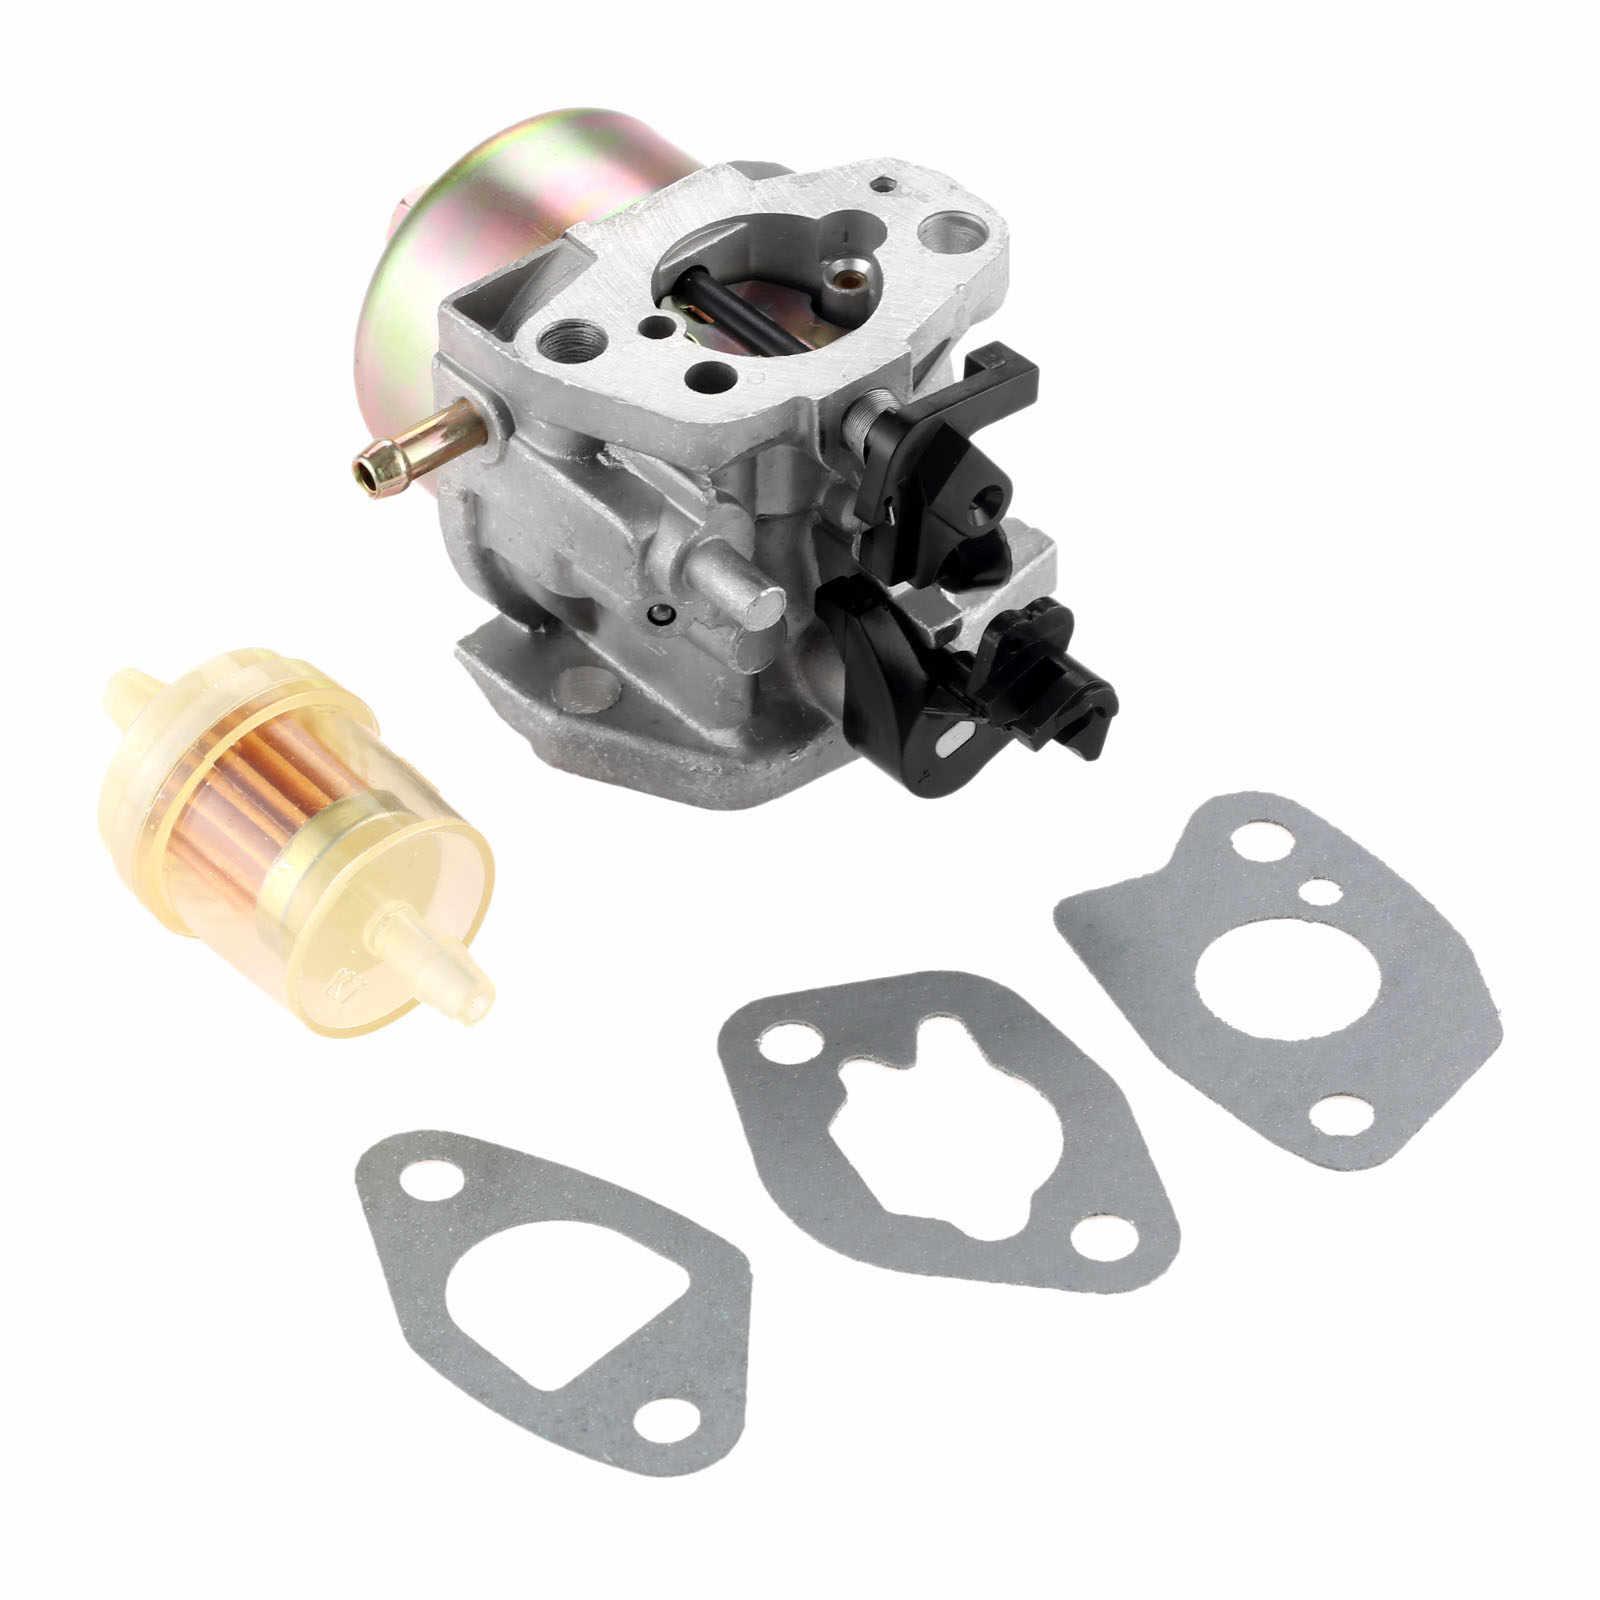 medium resolution of  dreld carburetor with carburetor gasket fuel filter for mtd cub cadet troy bilt lawn mower